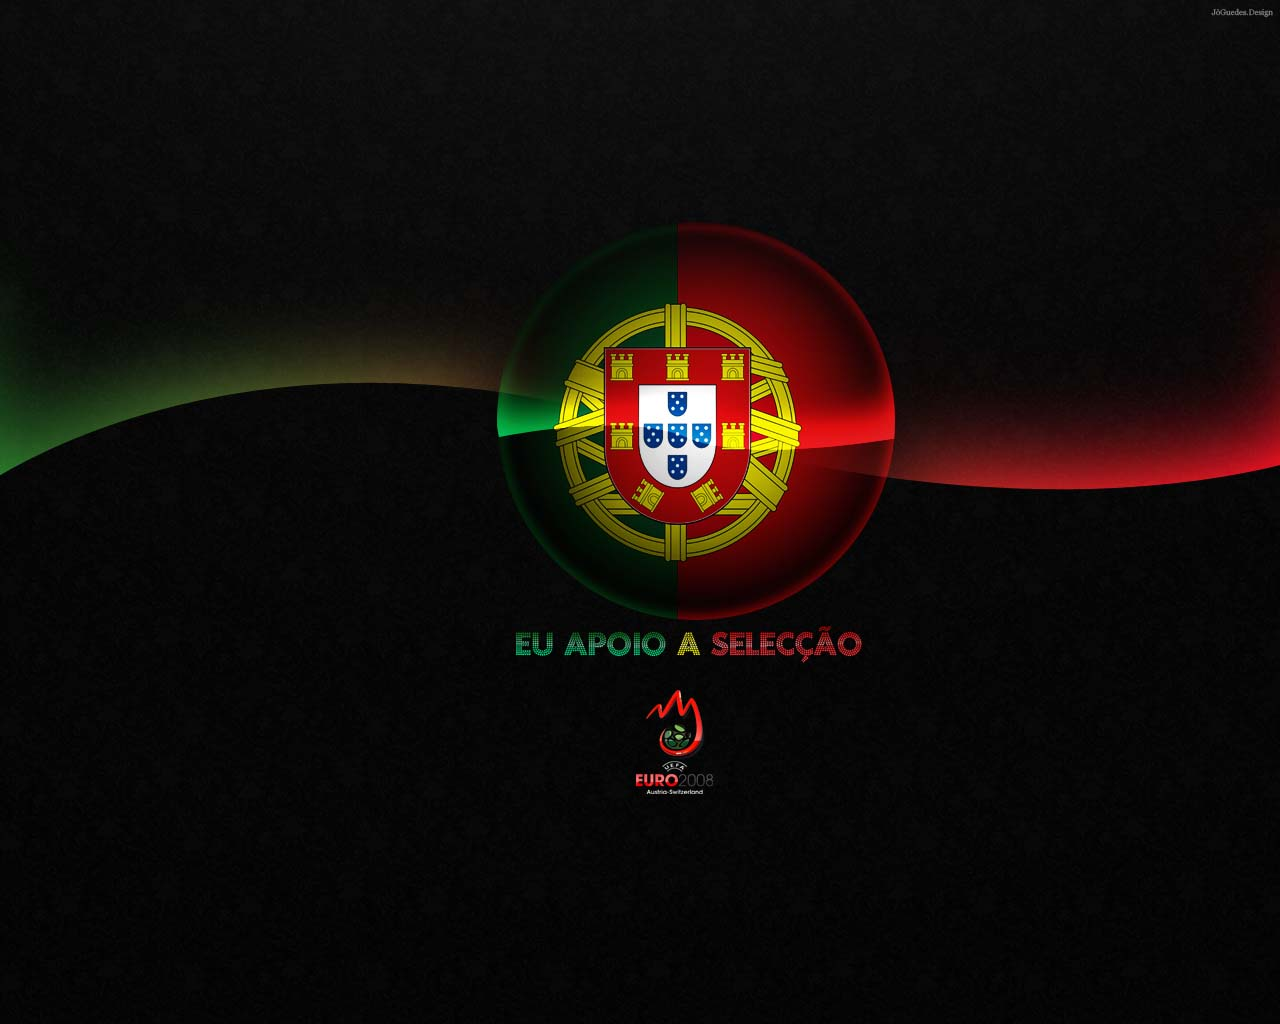 portugal wallpaper - photo #20